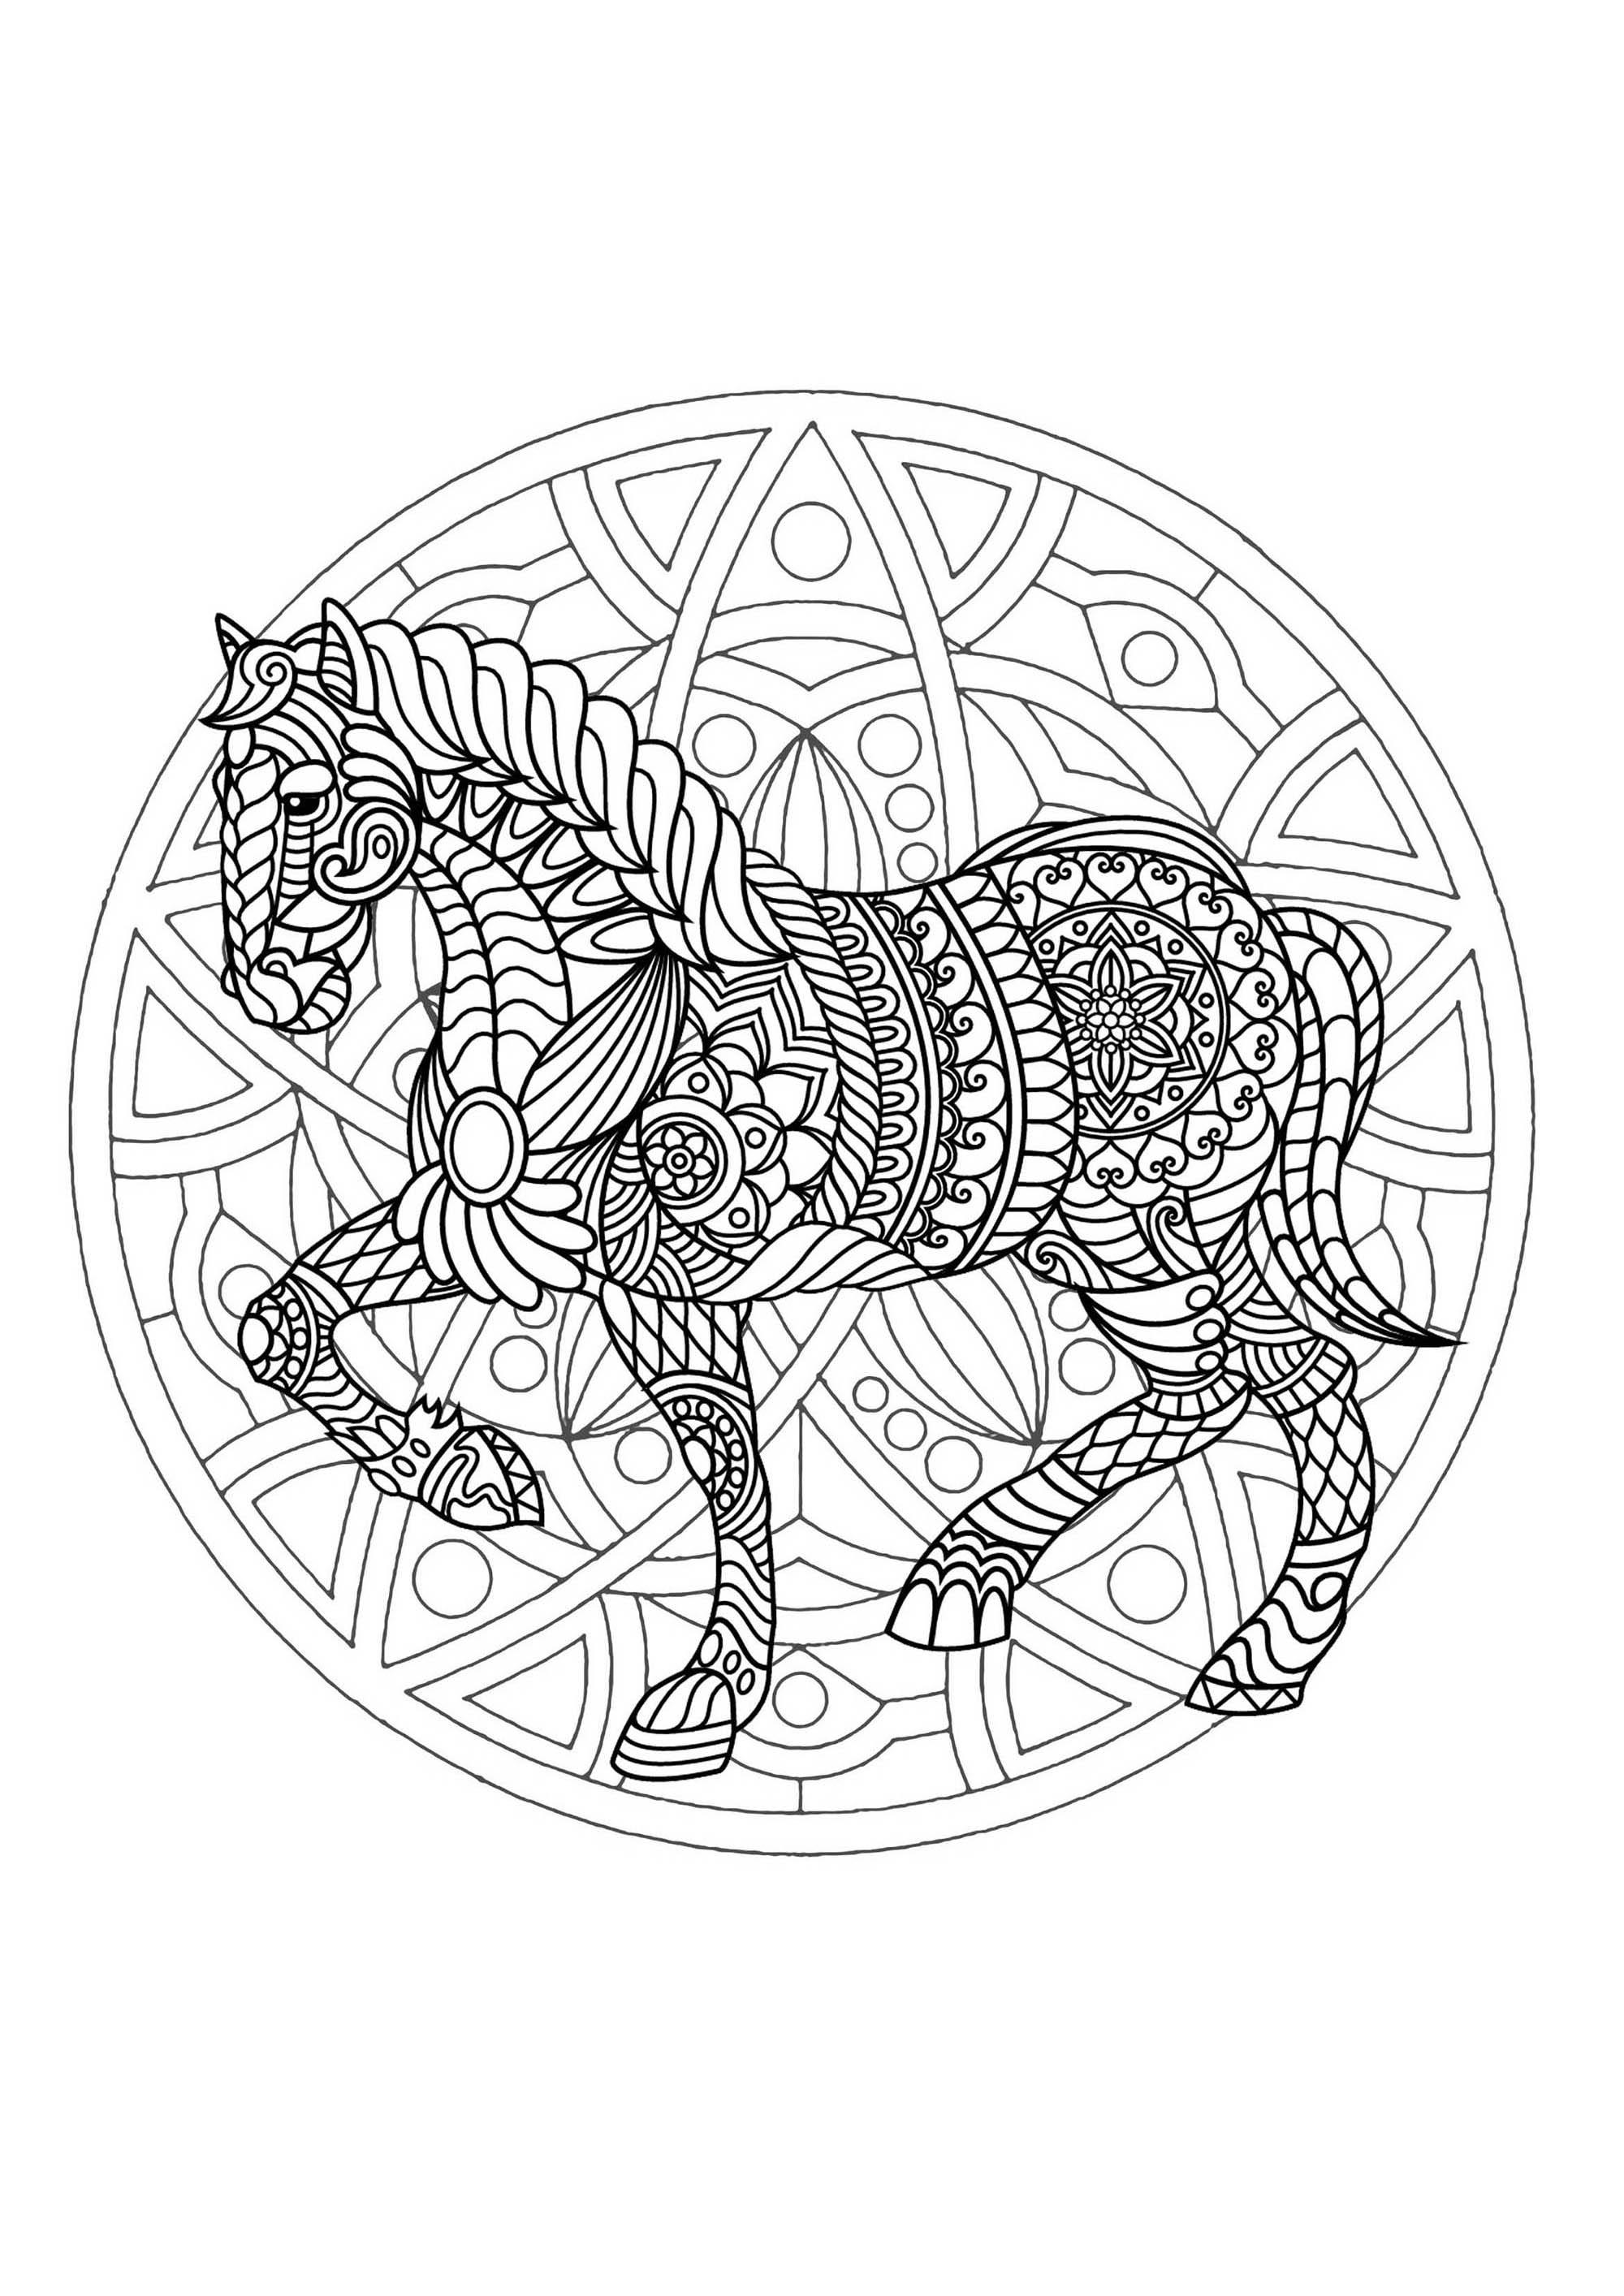 Mandala cheval 1 mandalas sur le th me des animaux 100 - Animaux mandala ...